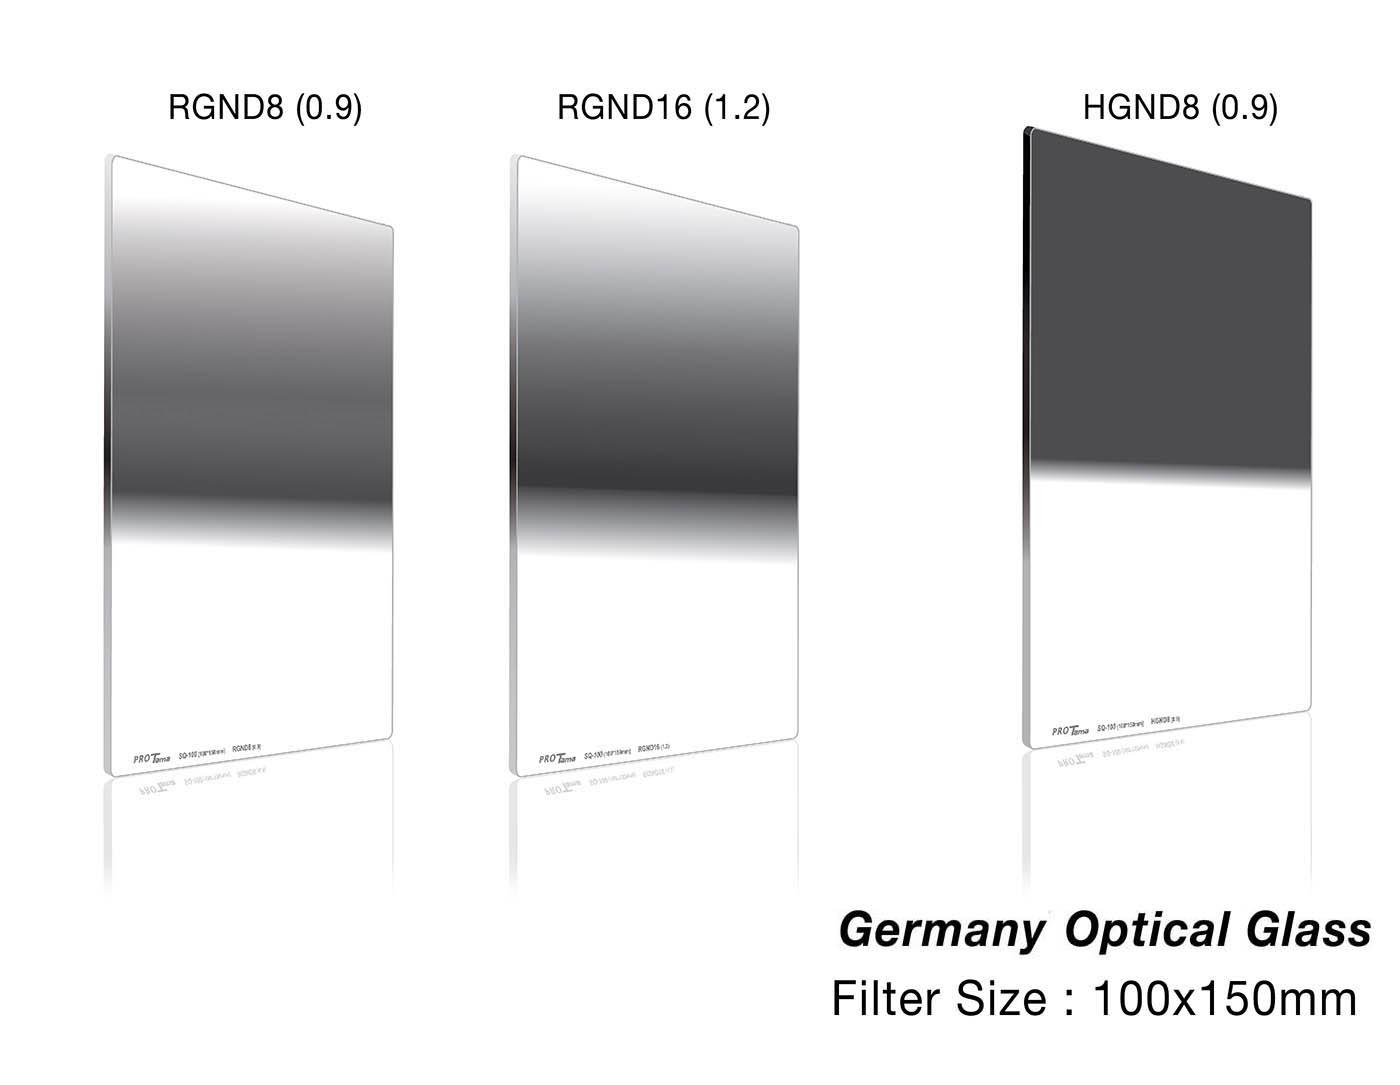 ProTama 天馬 (SQ-100) HD 高清方形濾鏡 100x150 (RGND8, RGND16, HGND8) - 德國光學玻璃材料